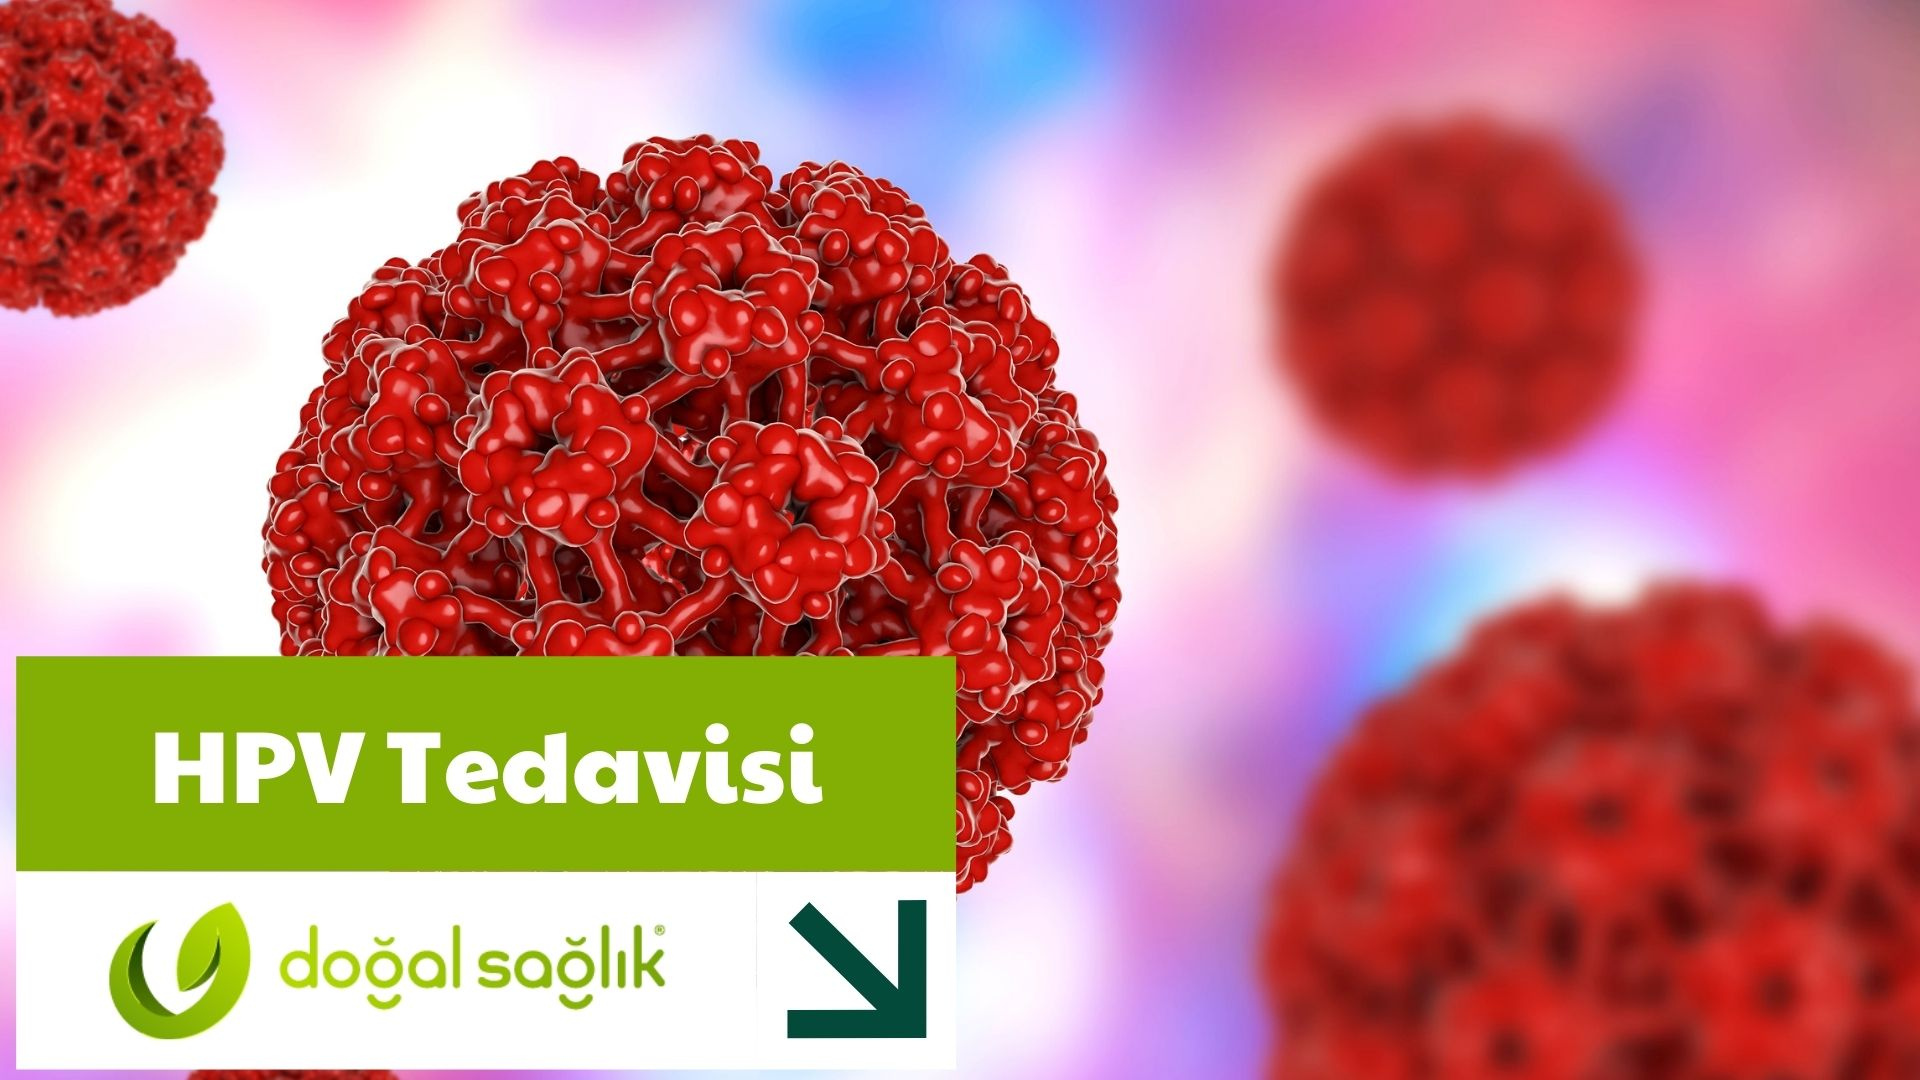 HPV Tedavisi